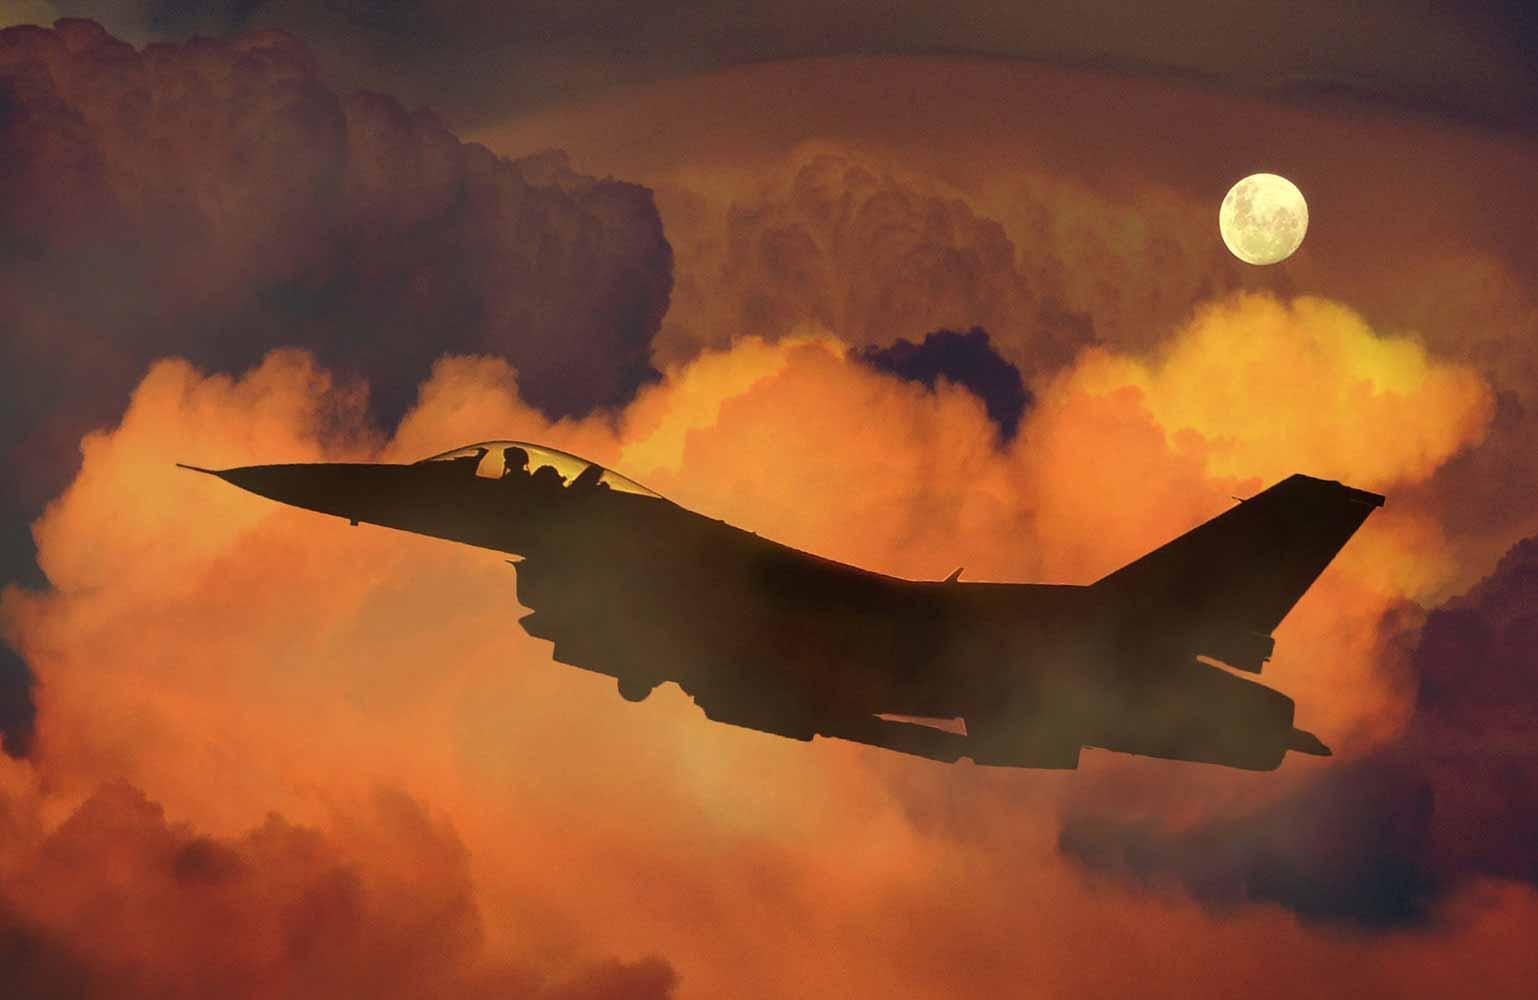 Jet fighter - On sunset